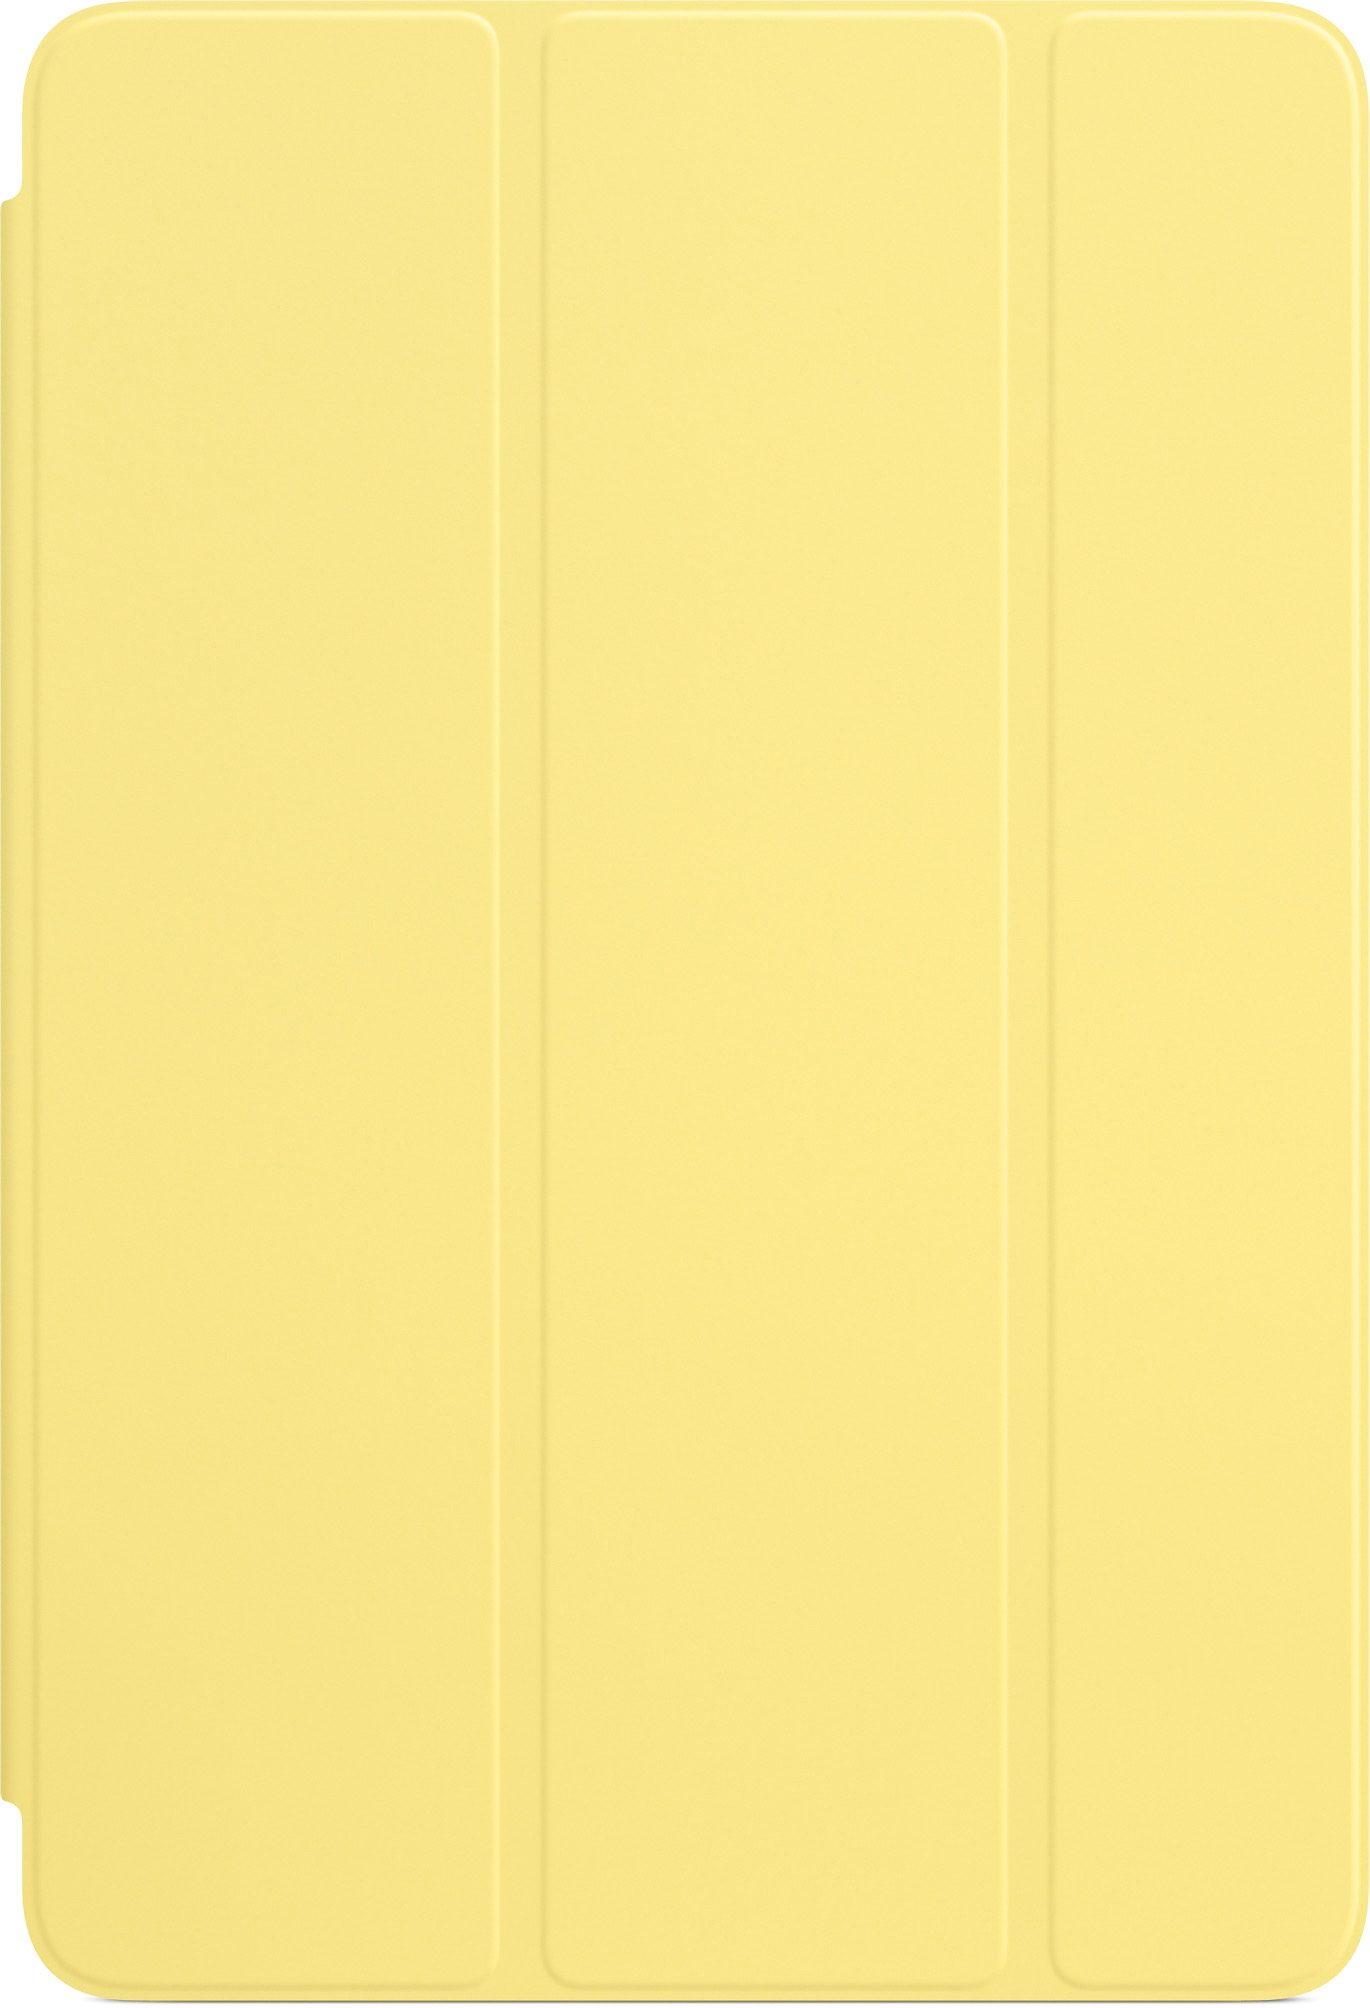 Apple iPad Mini Retina Smart Cover Schutzhülle Polyurethan Schutzhülle